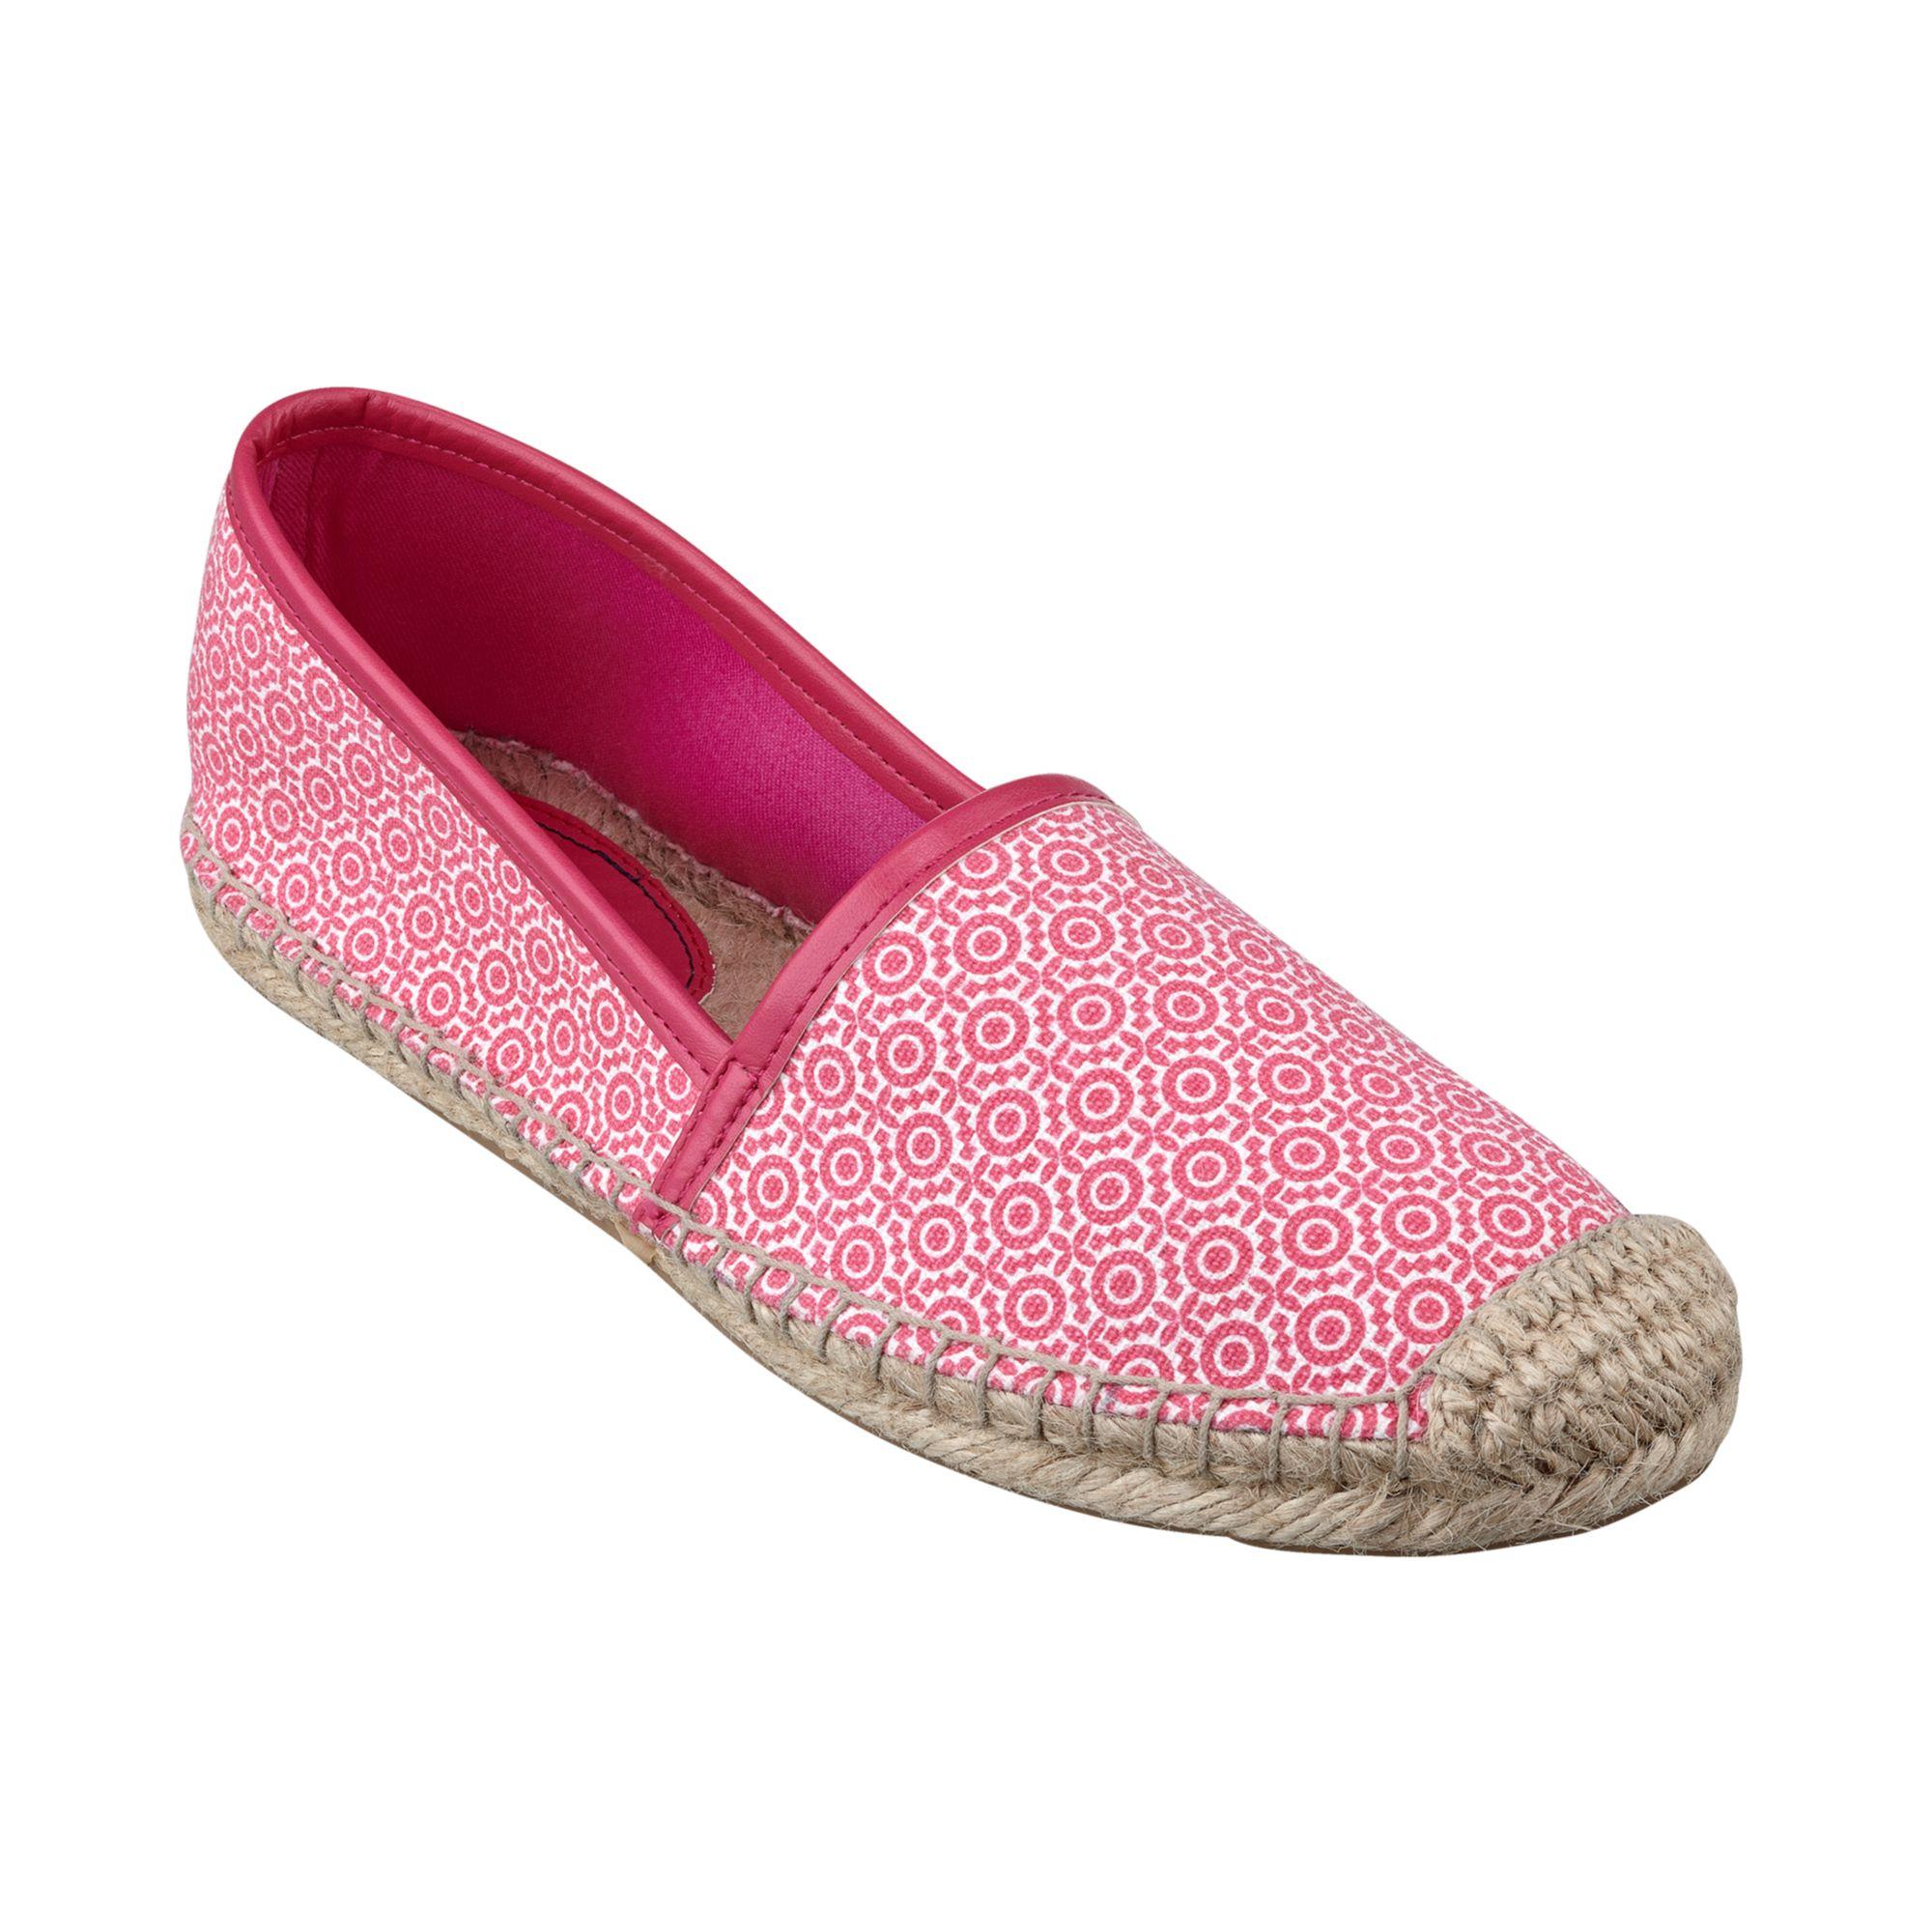 41e808fdd7d70 Lyst - Tommy Hilfiger Womens Heyda Espadrille Flats in Pink